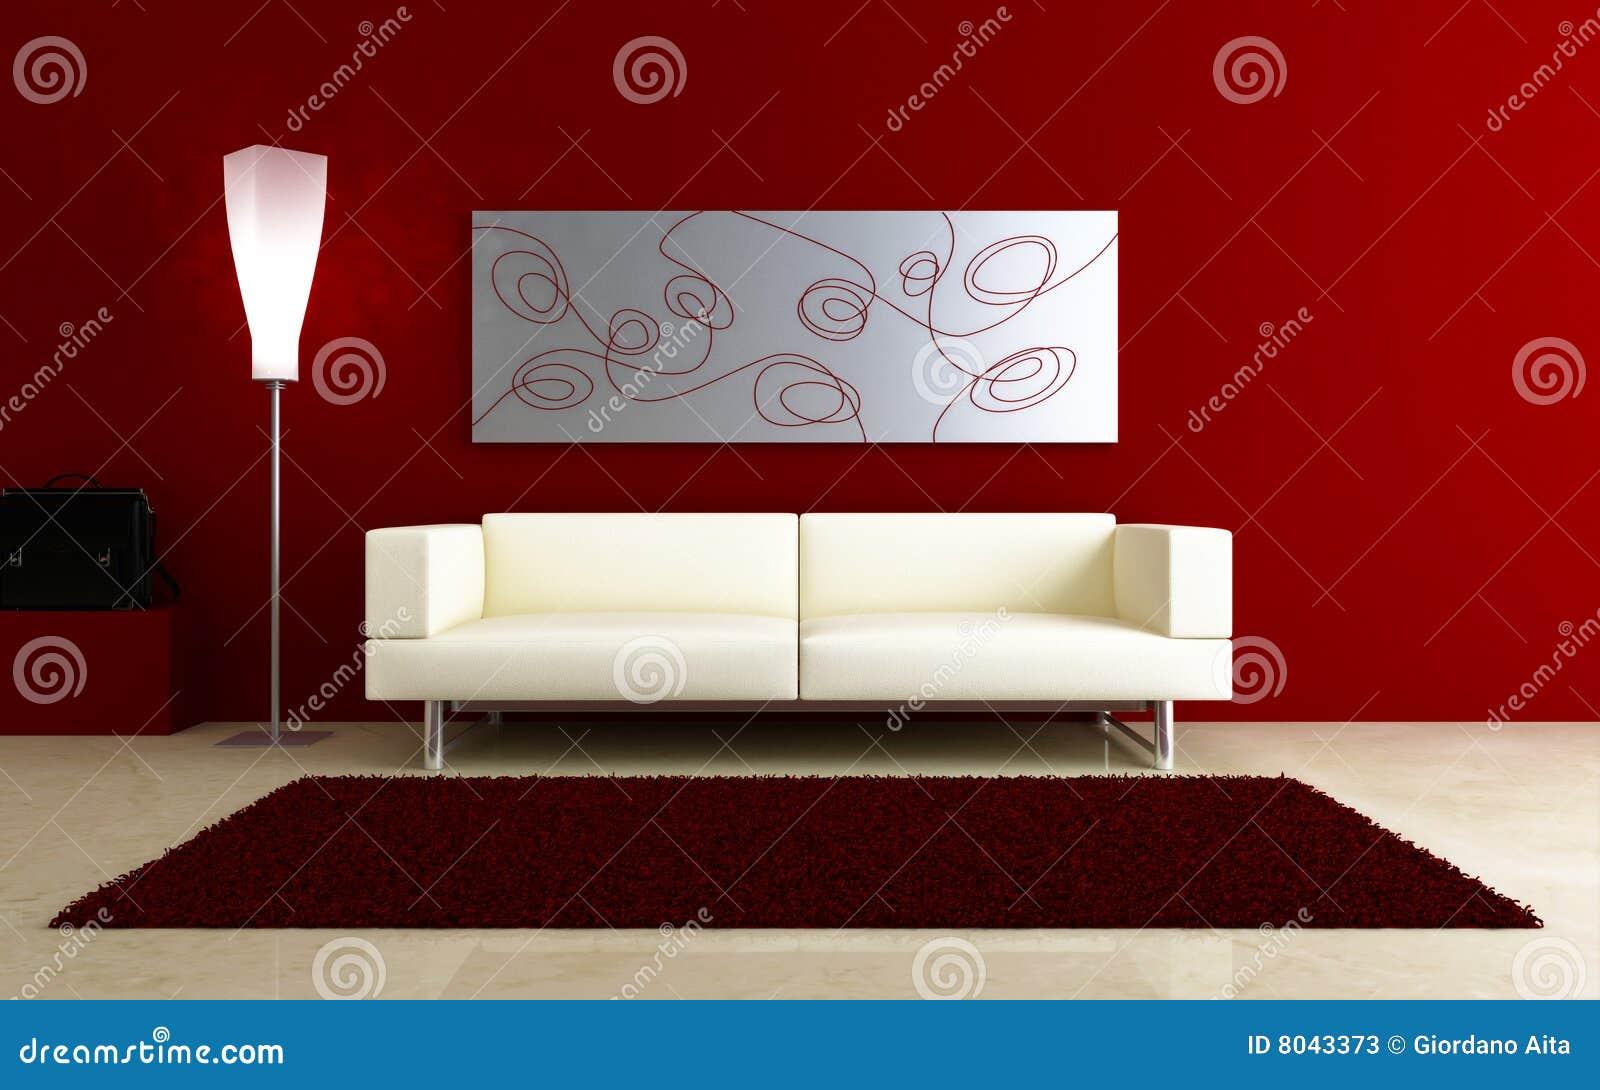 wohnzimmer sofa im raum:Red Room White Couch